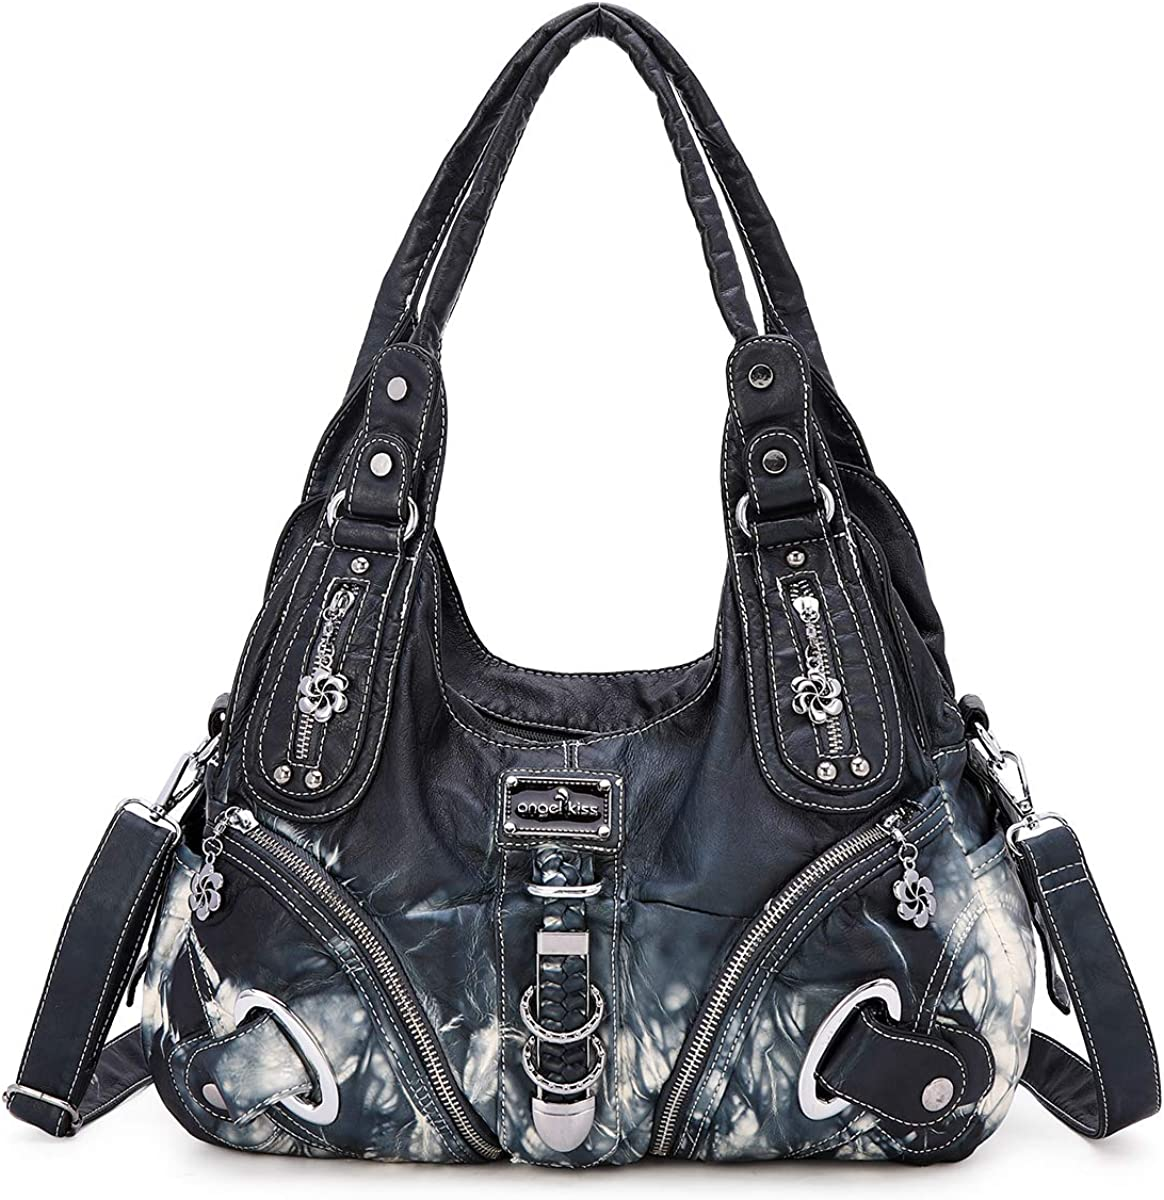 Women Handbags Purses Shoulder Bags PU Leather Satchel Hobo Tote Bags